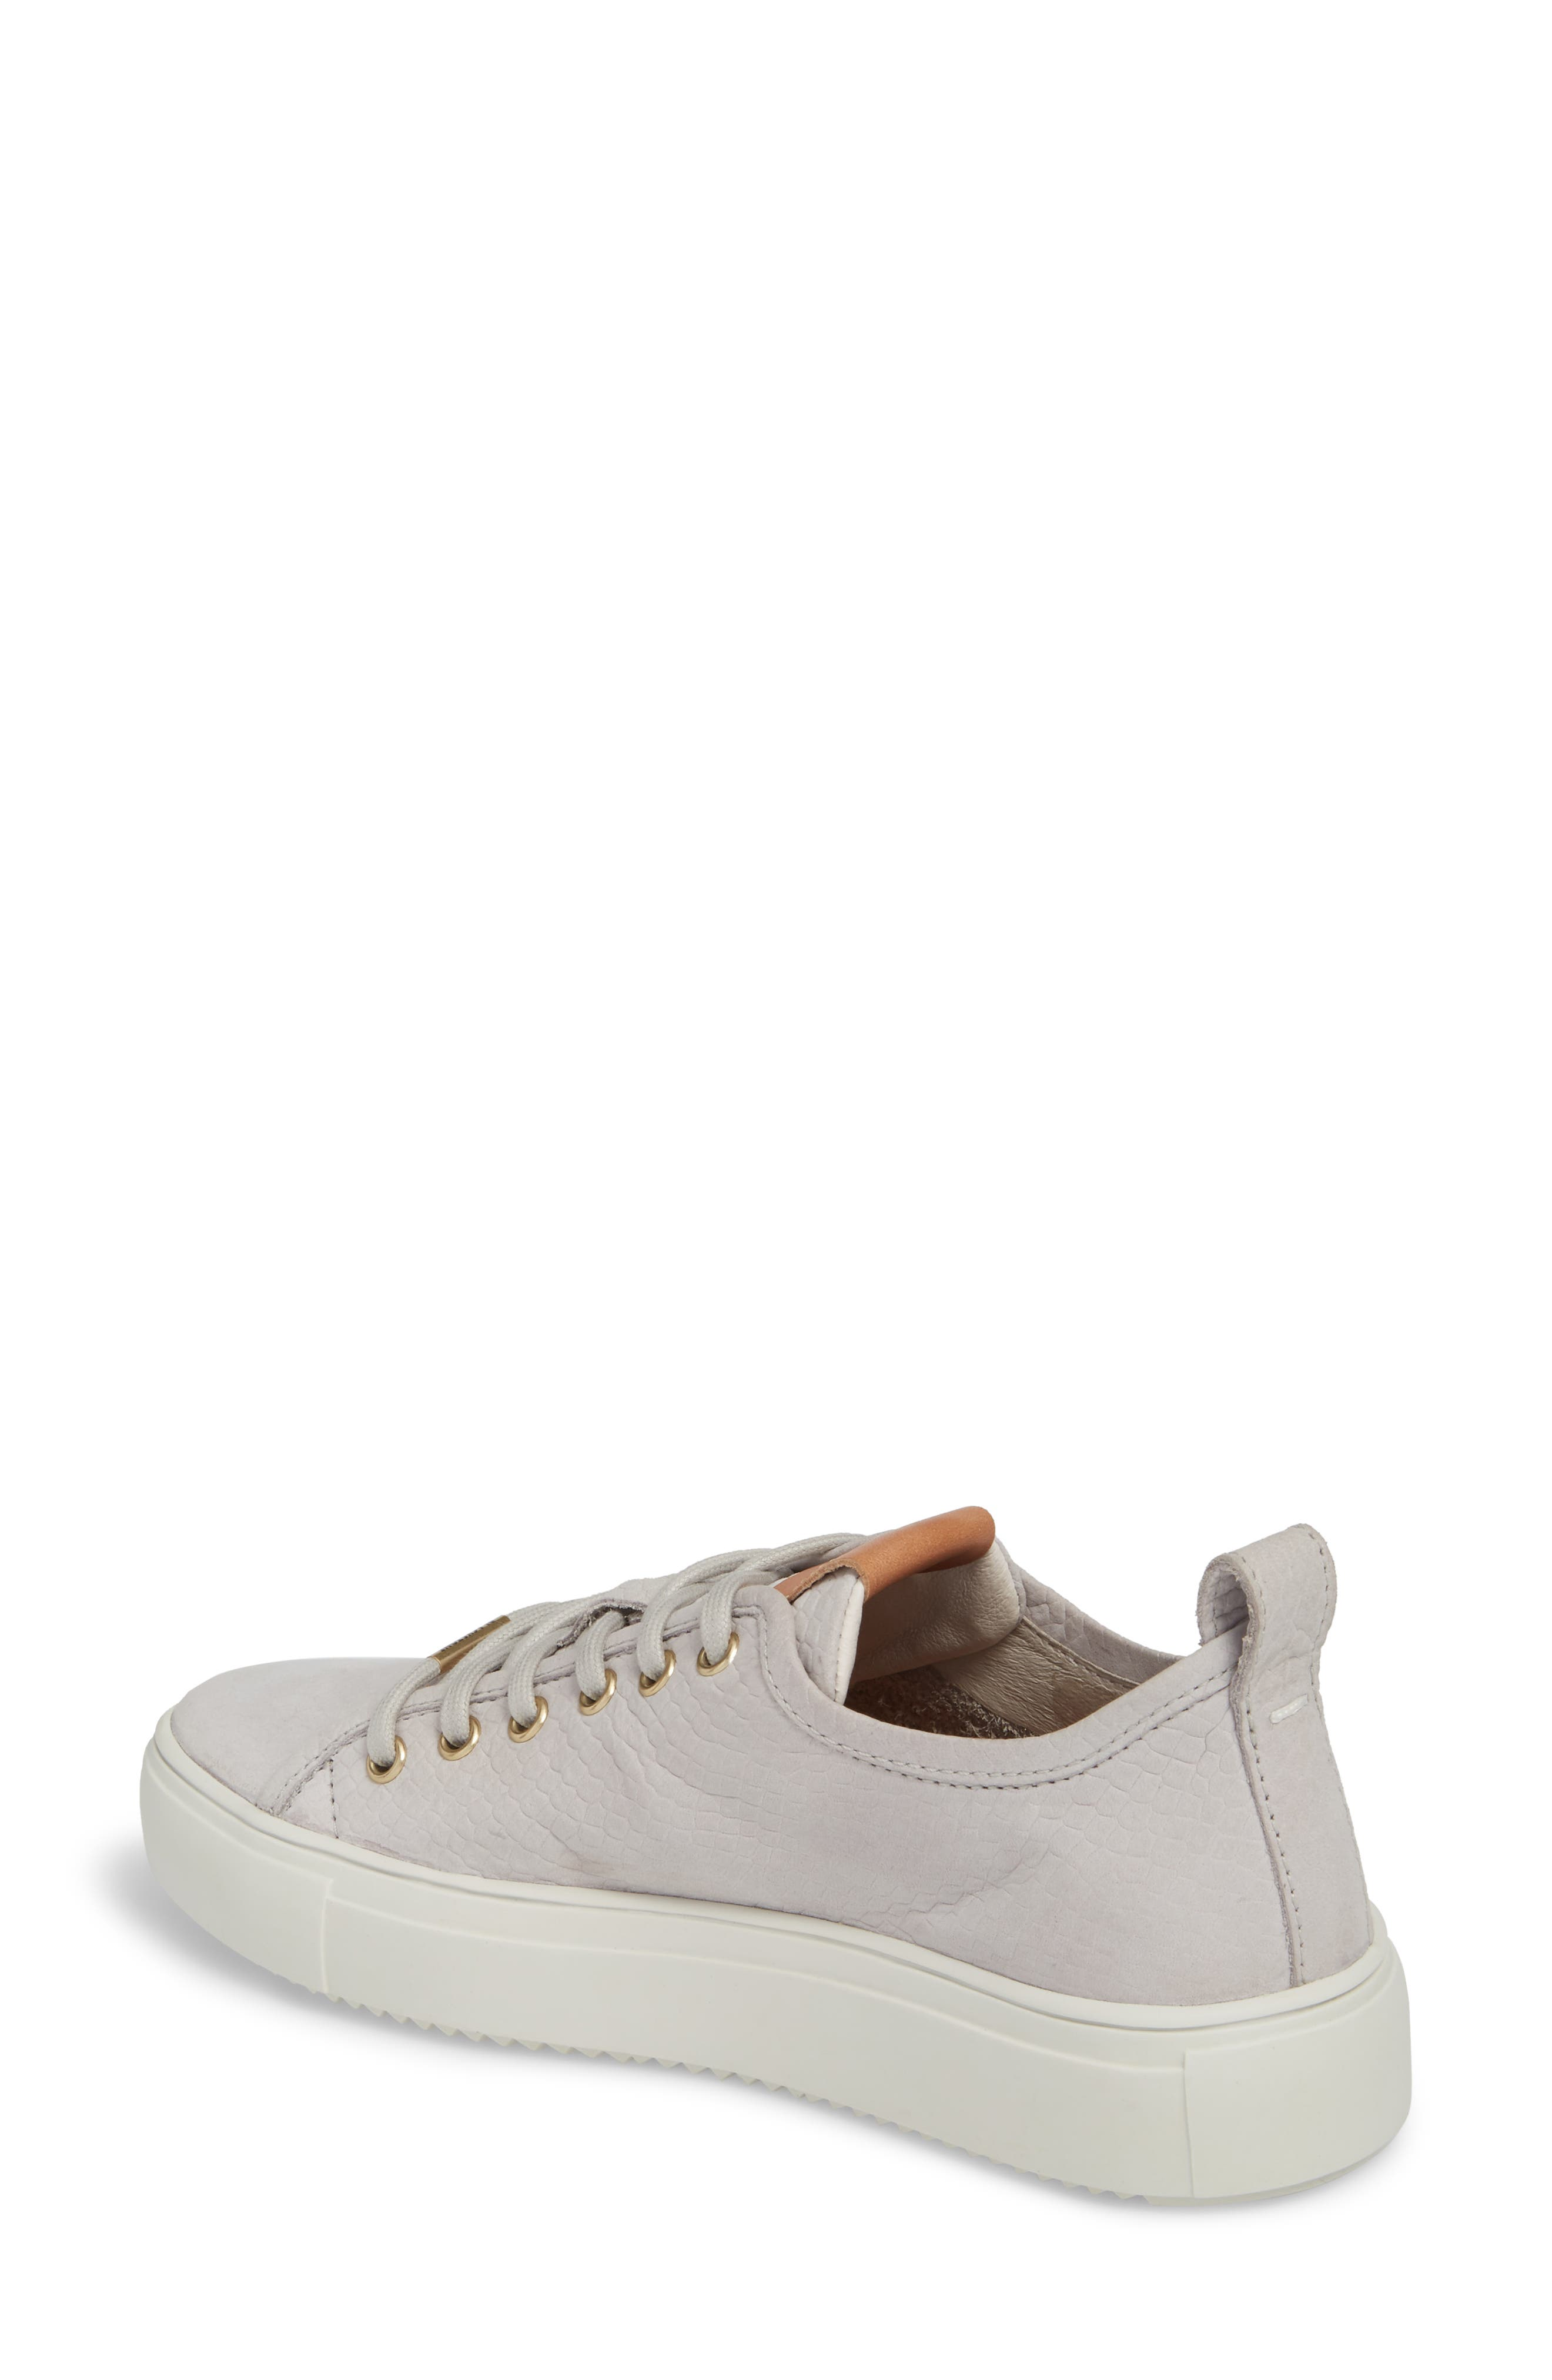 PL90 Sneaker,                             Alternate thumbnail 2, color,                             MYCRO CHIP LEATHER